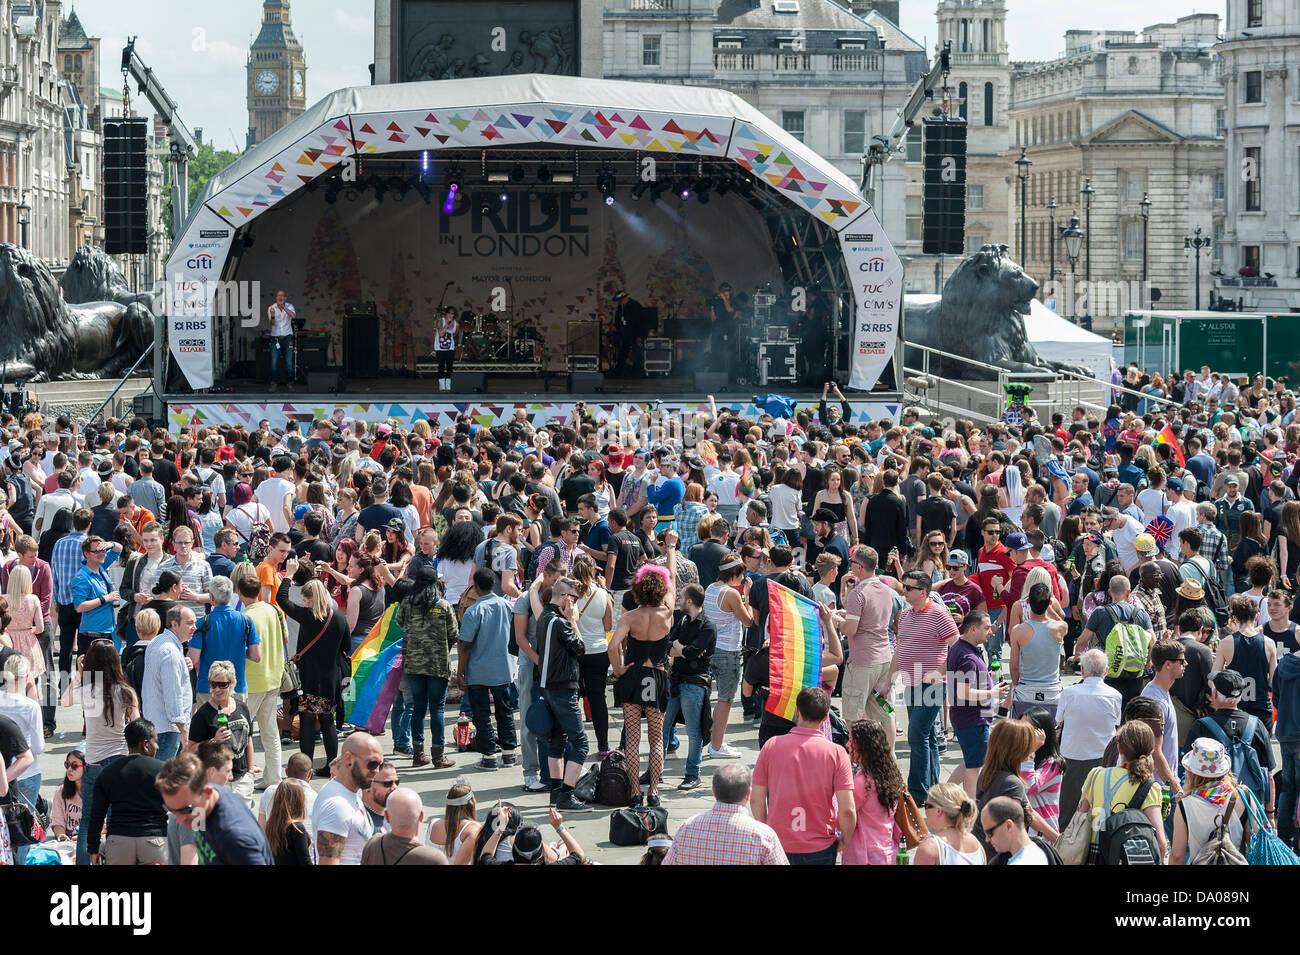 London, UK. 29th June 2013.  Crowds gathering in Trafalgar Square to celebrate London Pride.  Photographer:  Gordon - Stock Image